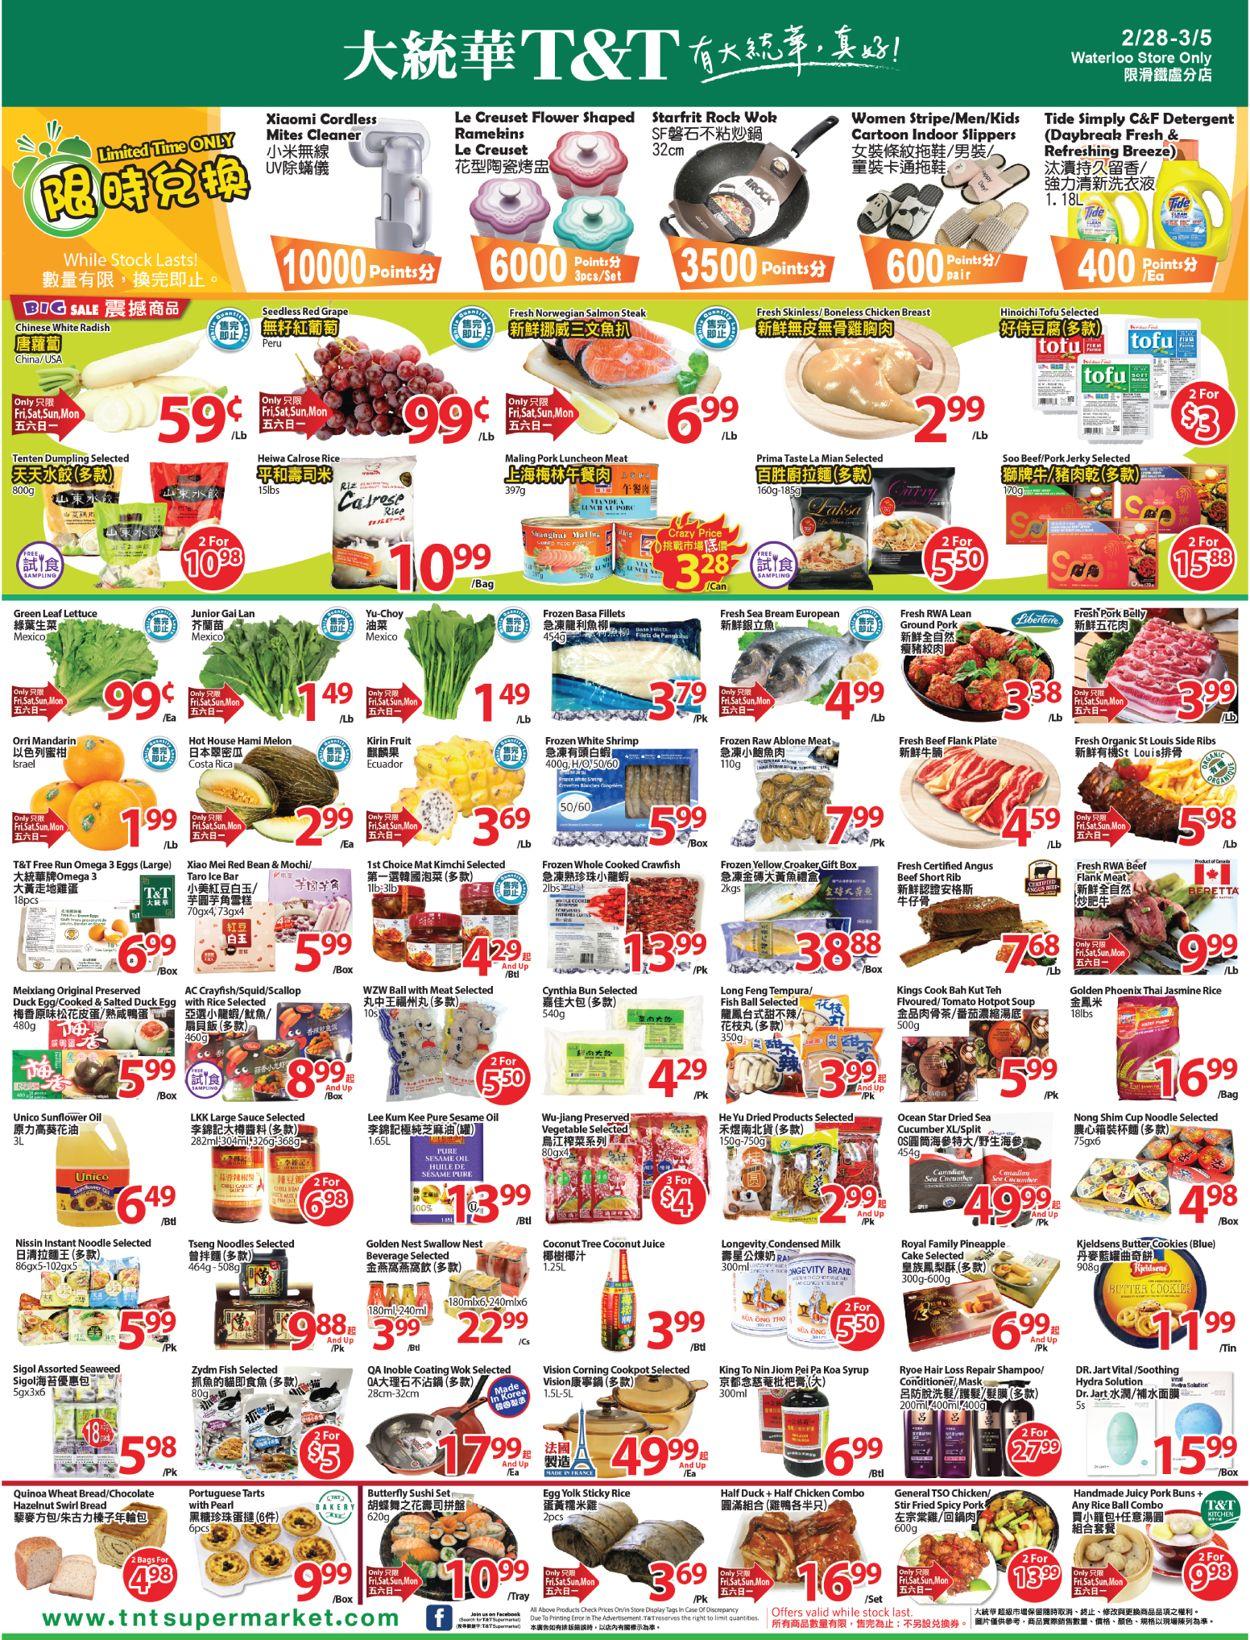 T&T Supermarket Flyer - 02/28-03/05/2020